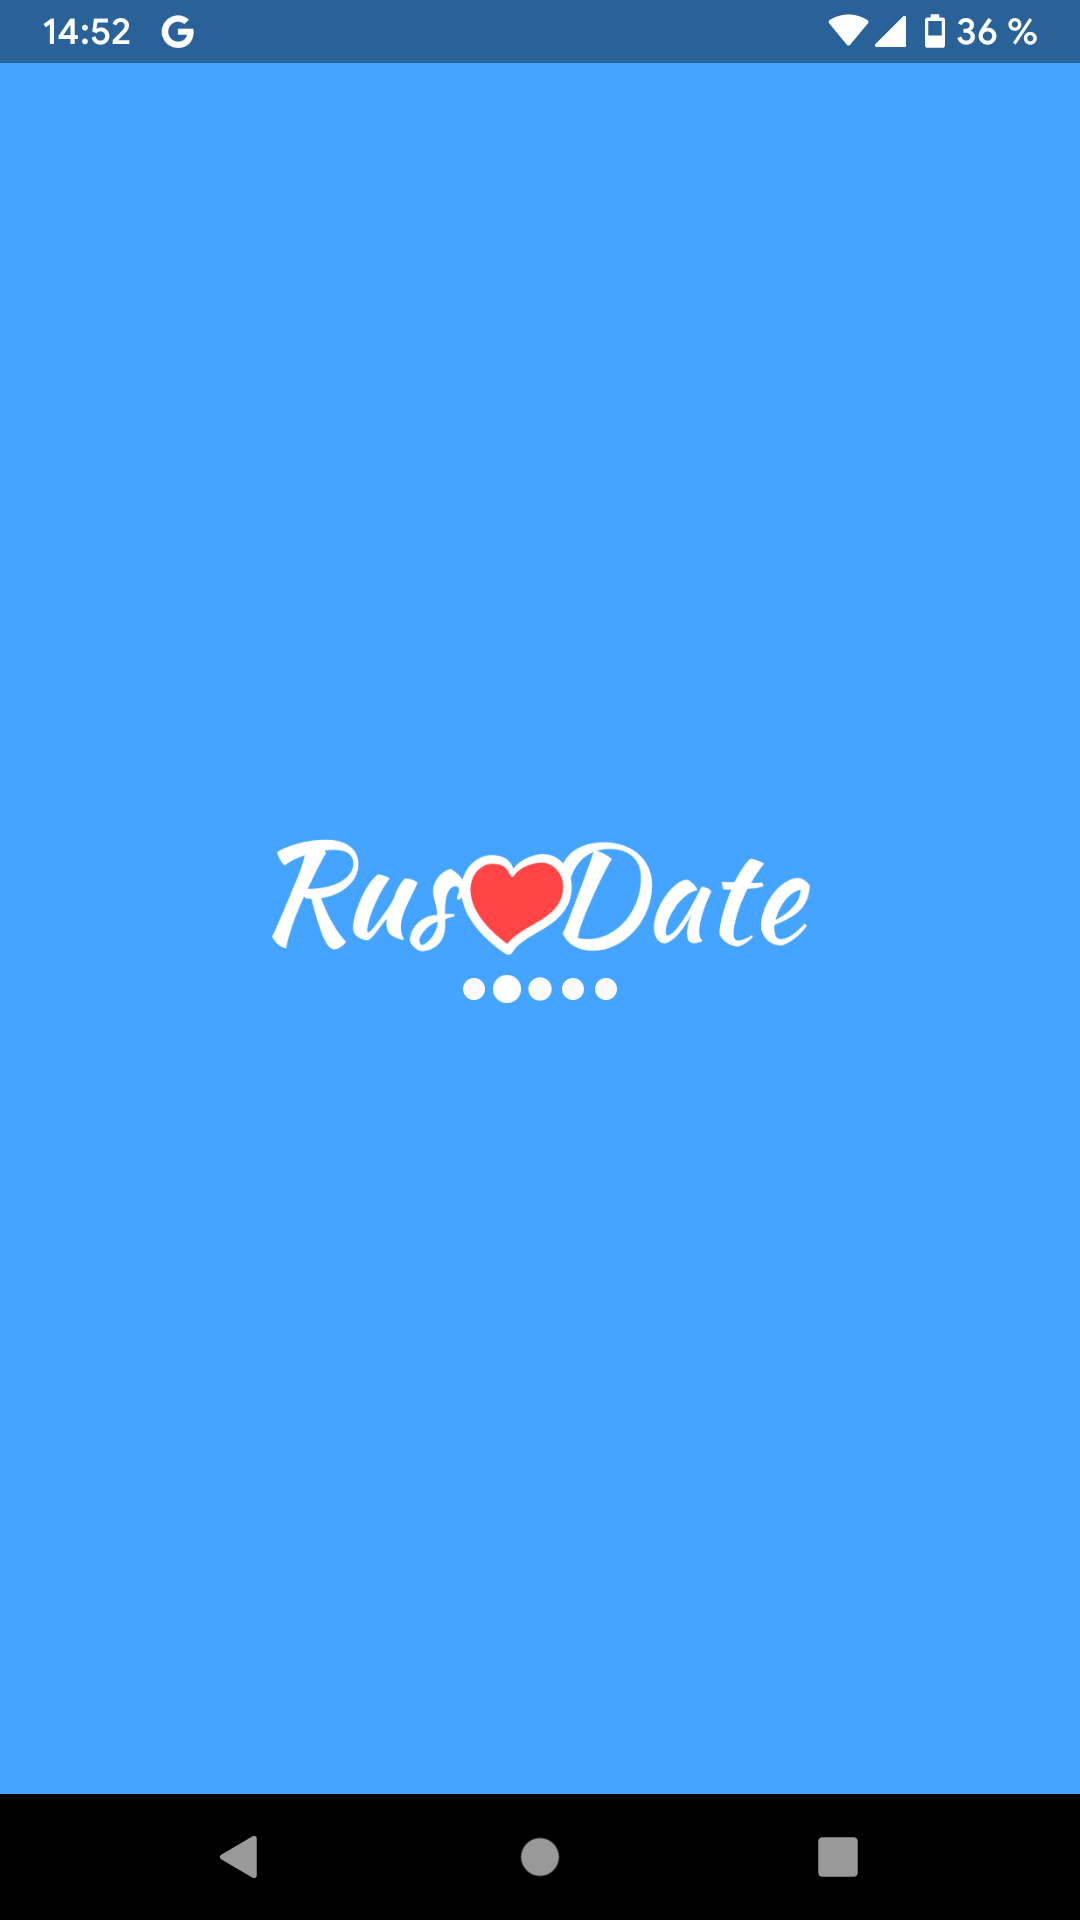 RusDate